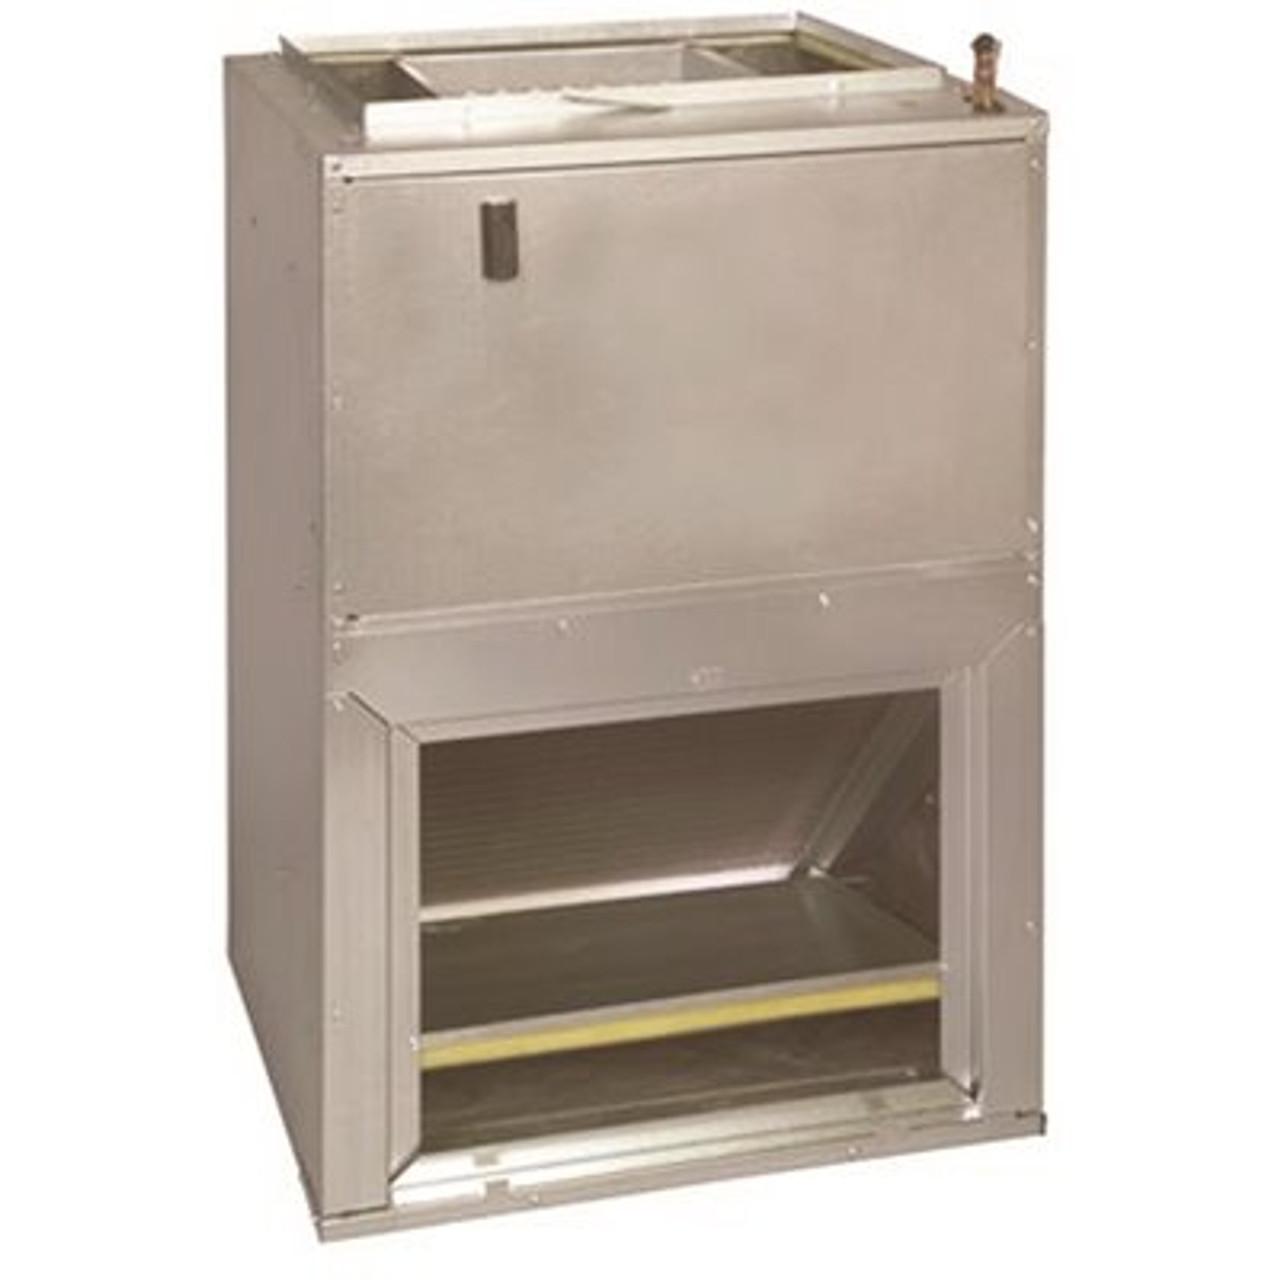 Goodman 30000 BTU 2.5 Ton Vertical Wall Mount Air Handler with Electric Heat - 5 kW - Item # 2493876, Goodman Part # AWUF310516, UPC Code 663051525450